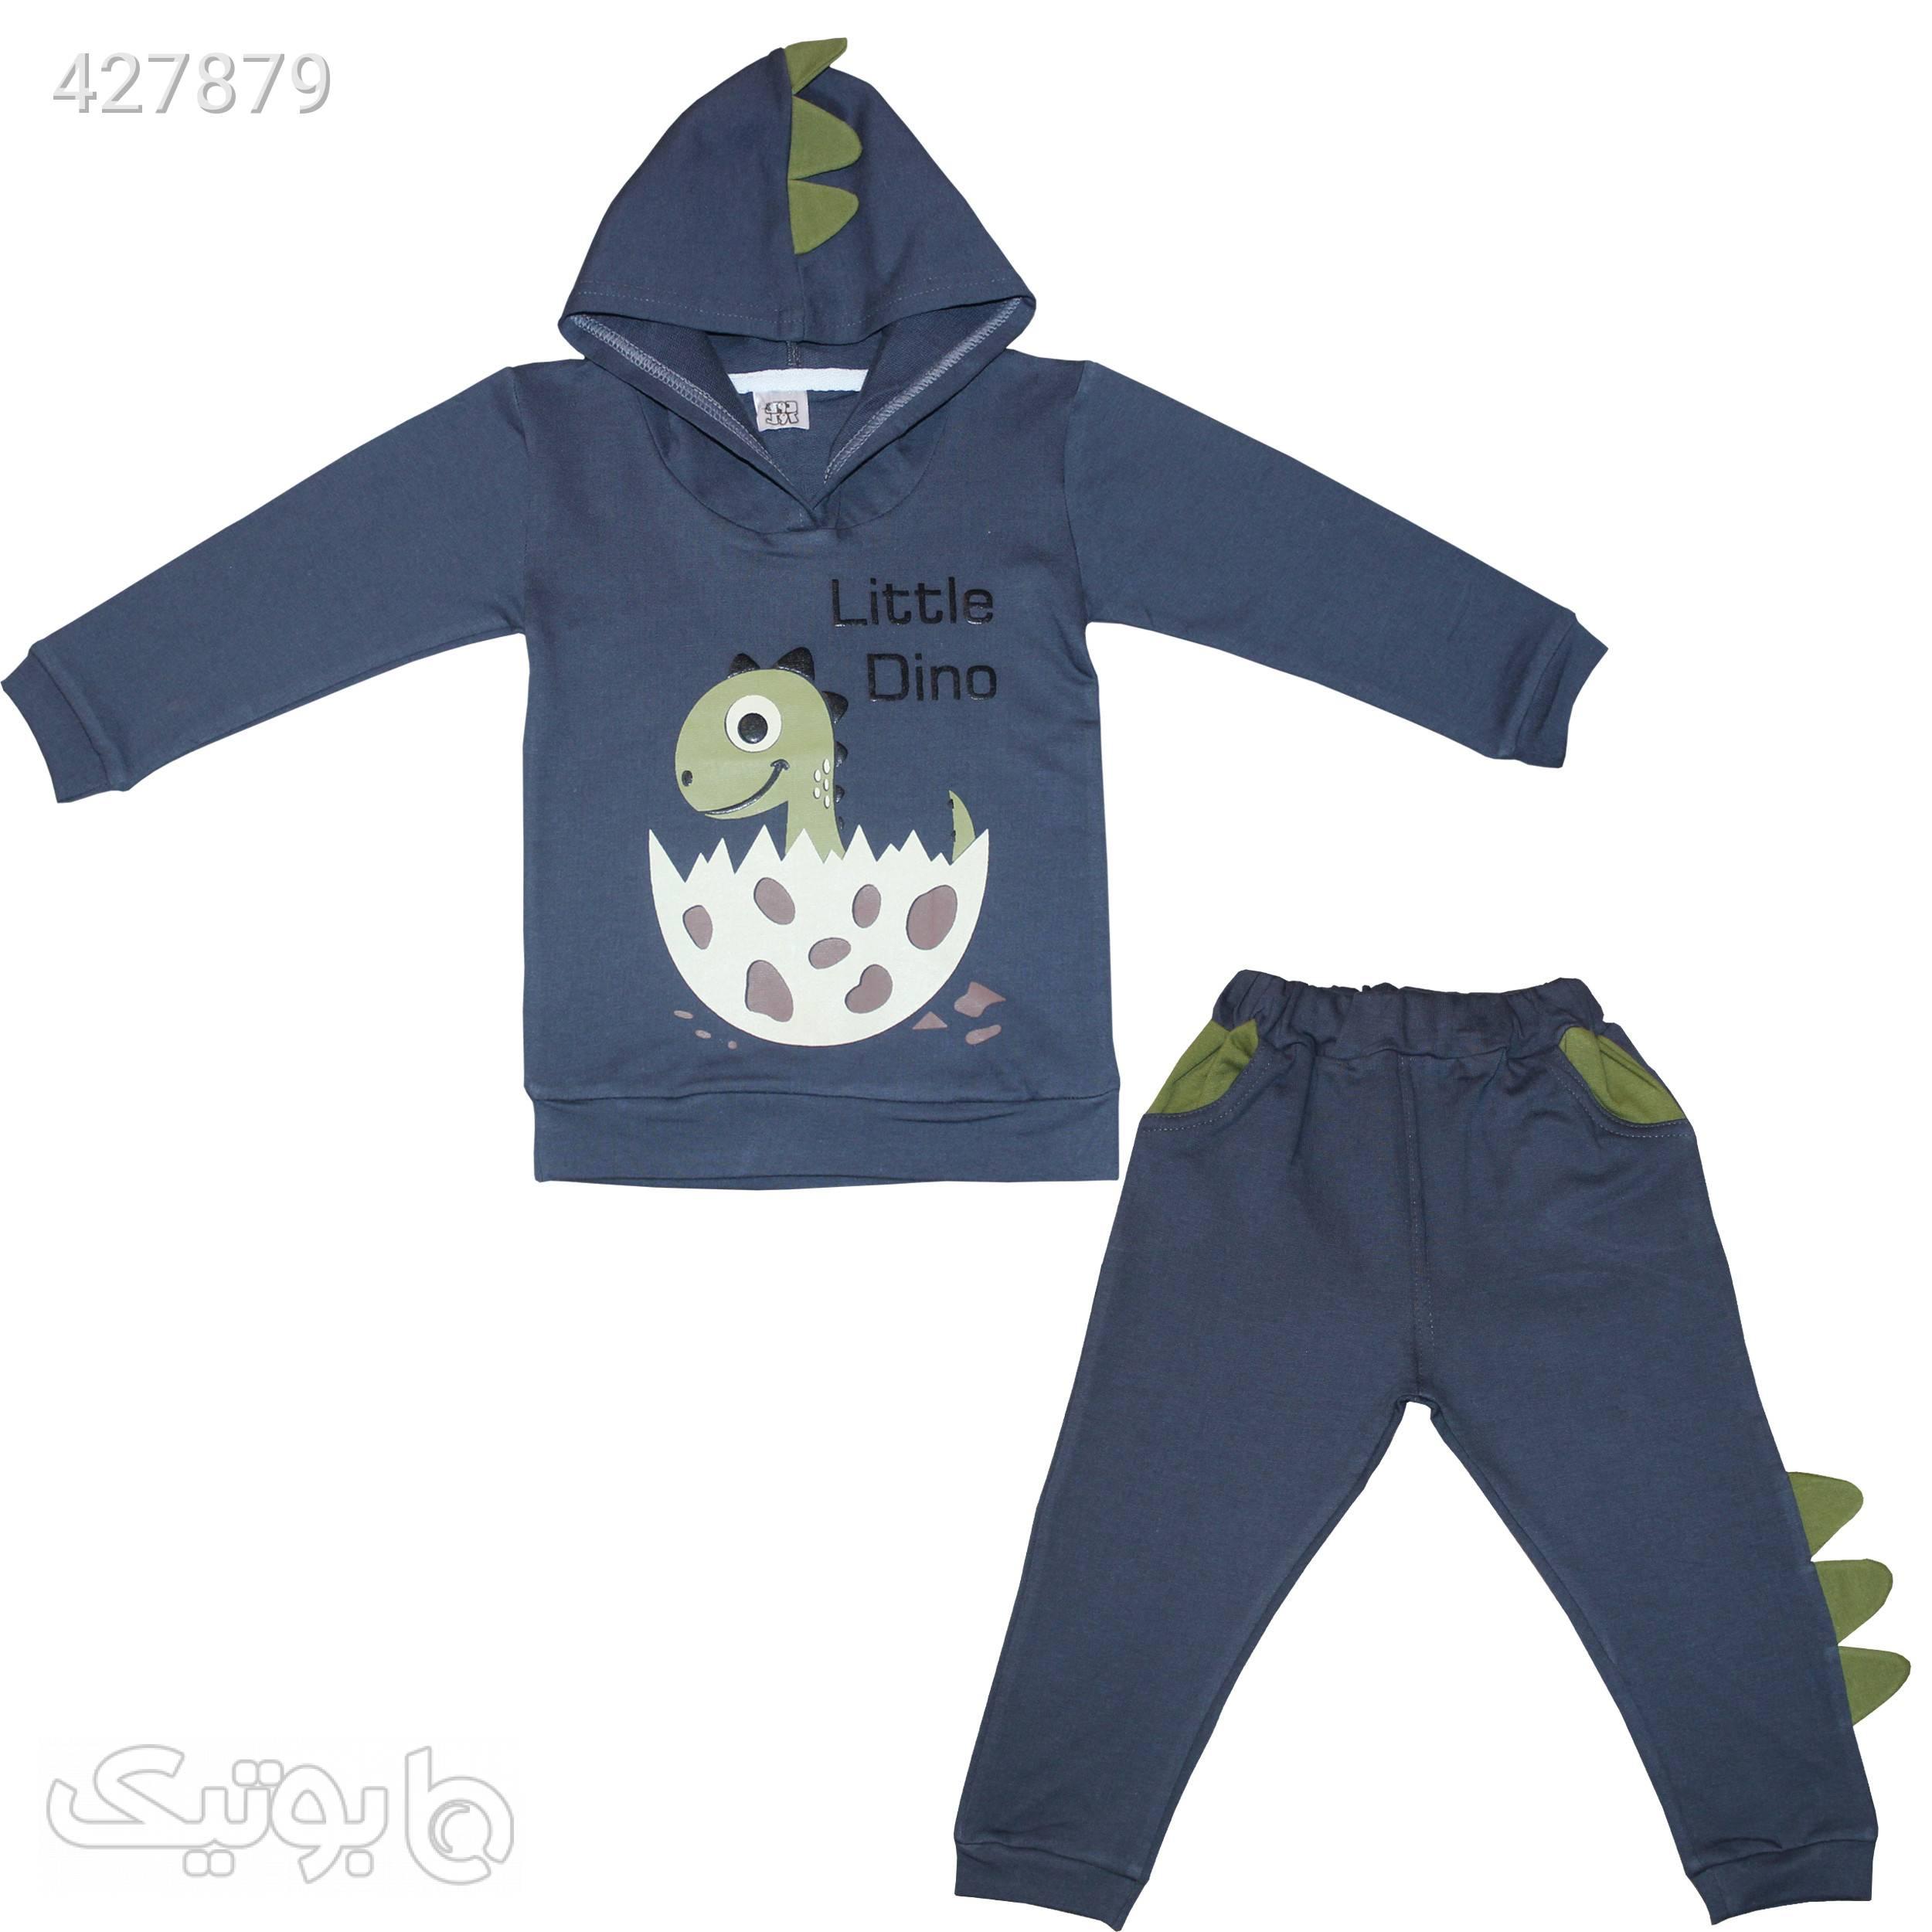 بلوز و شلوار داینو طوسی لباس کودک پسرانه